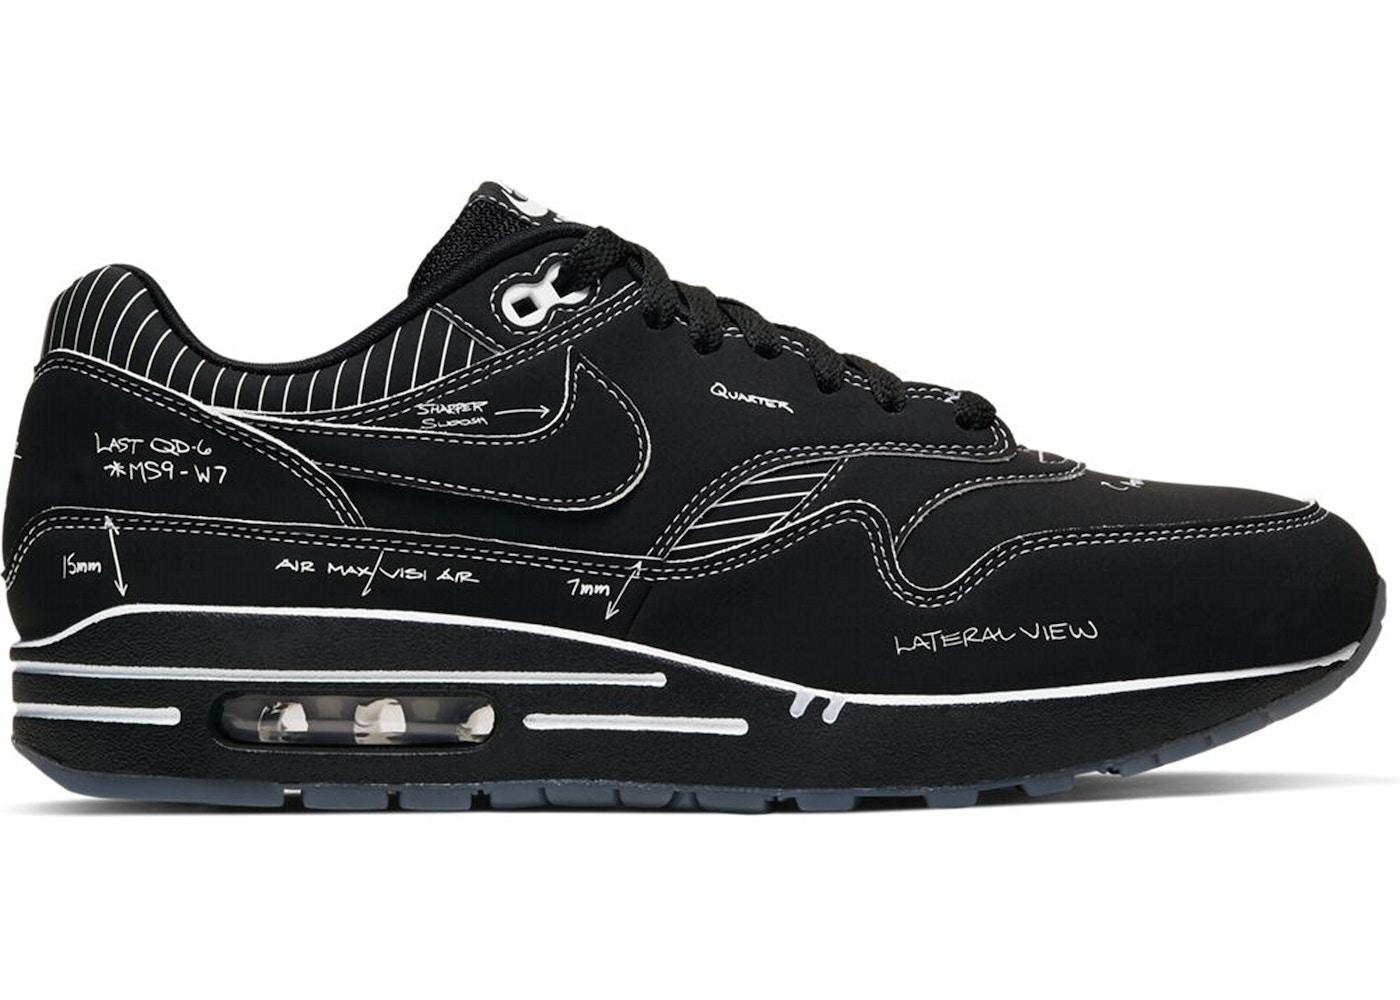 le dernier b33c4 27736 Buy Nike Air Max 1 Shoes & Deadstock Sneakers